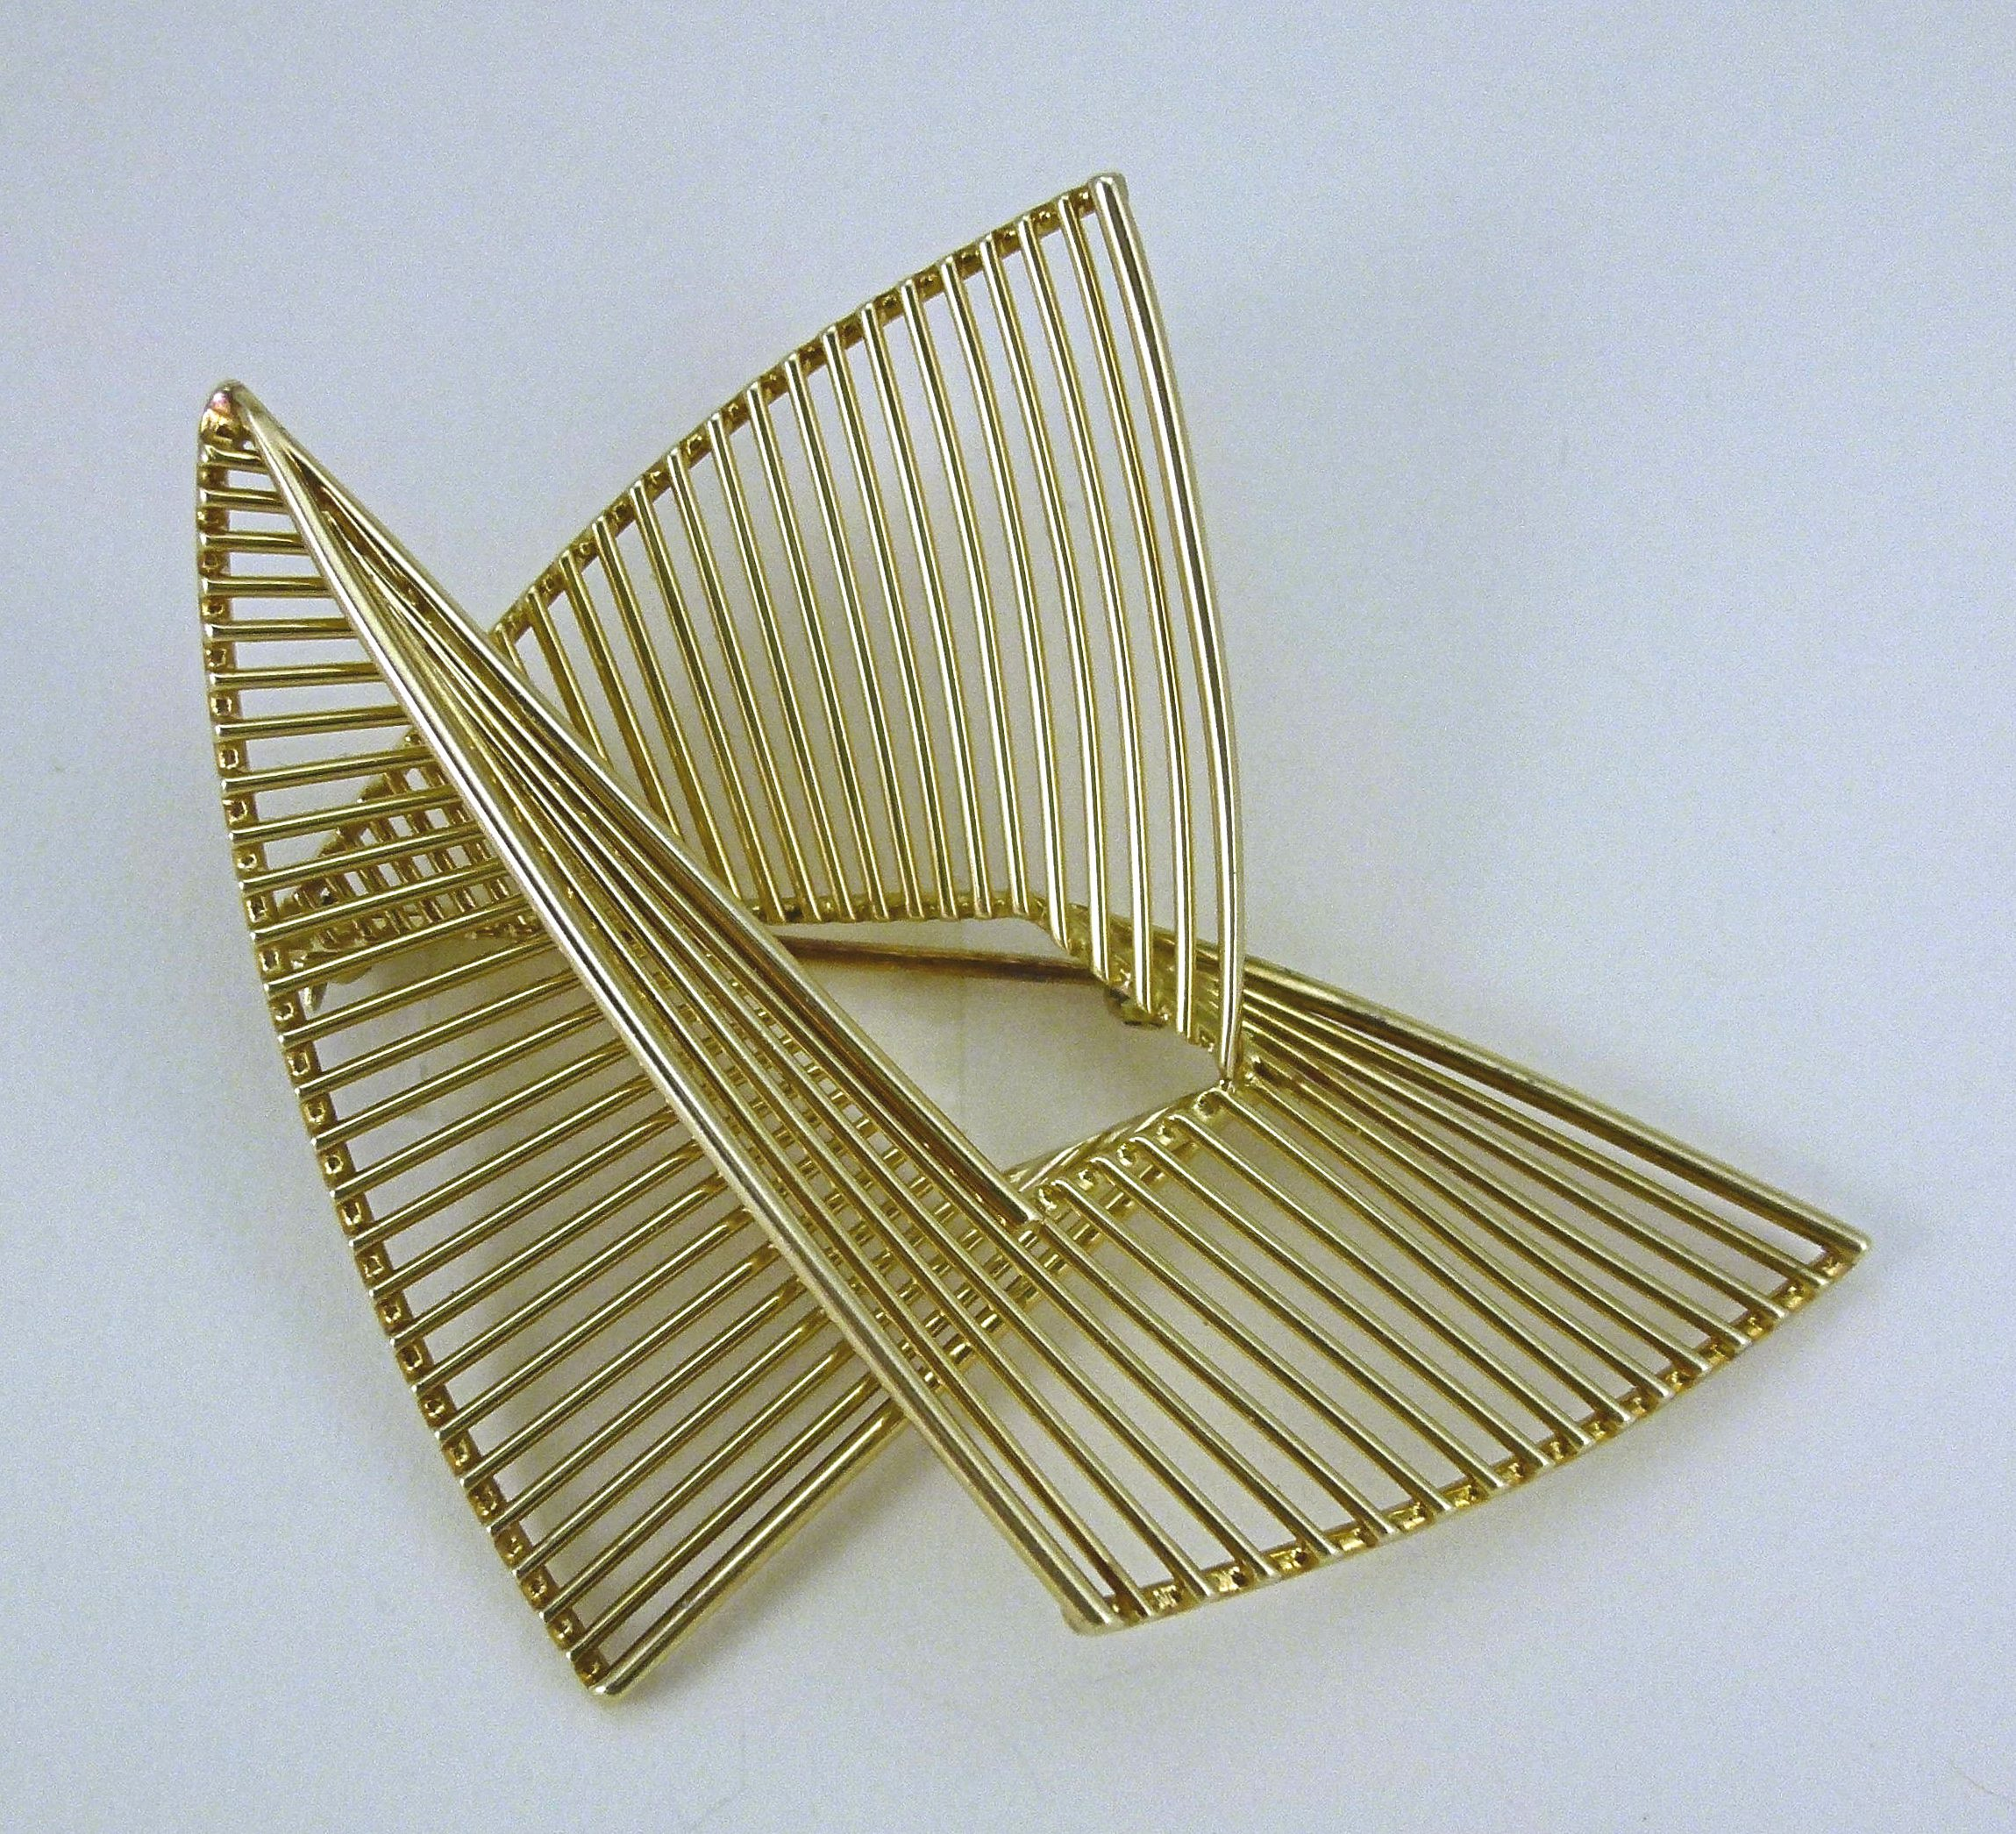 Archibald Dumbar, broche, 1950-1960. Particuliere verzameling, goud